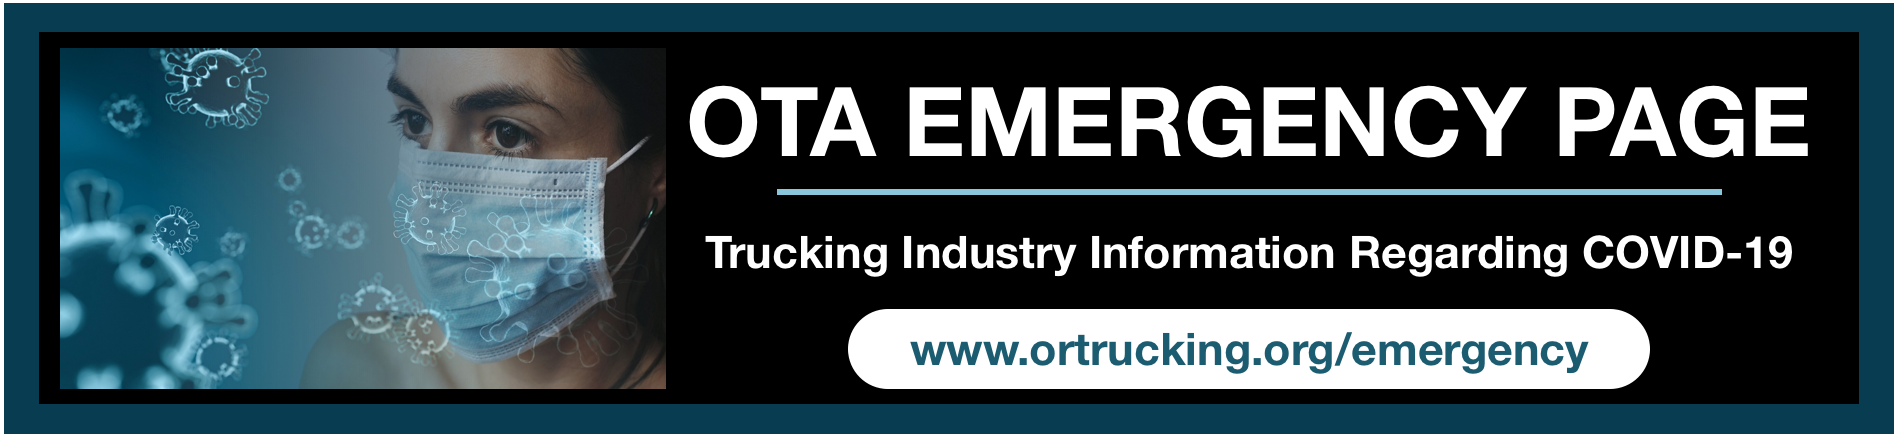 OTA Emergency Page Trucking Industry Information Regarding COVID-19